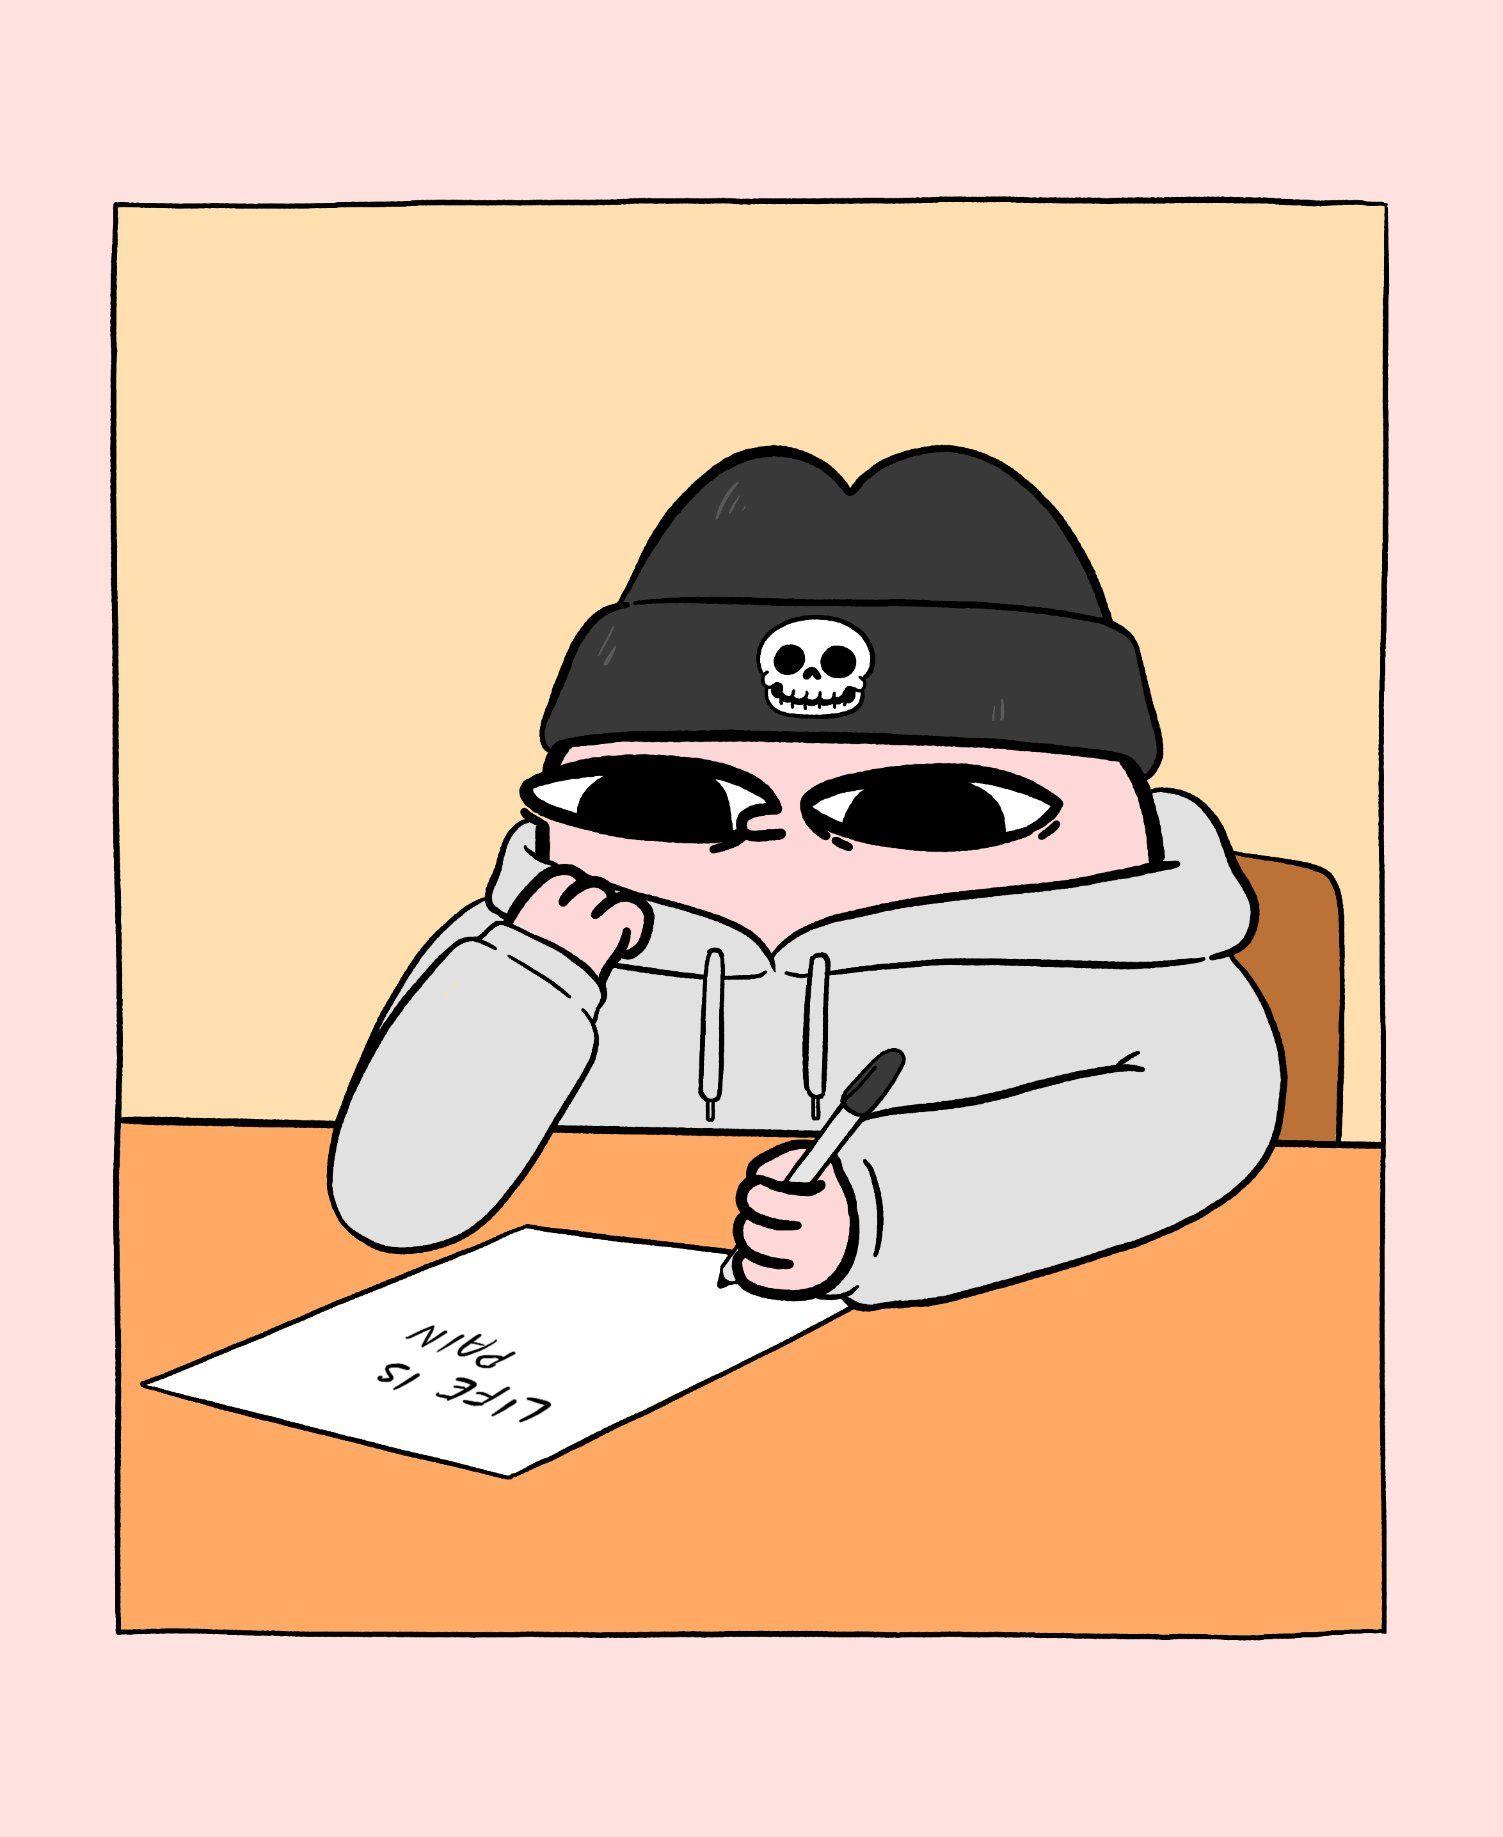 Ketnipz On Twitter Cute Patterns Wallpaper Cute Cartoon Wallpapers Funny Wallpapers